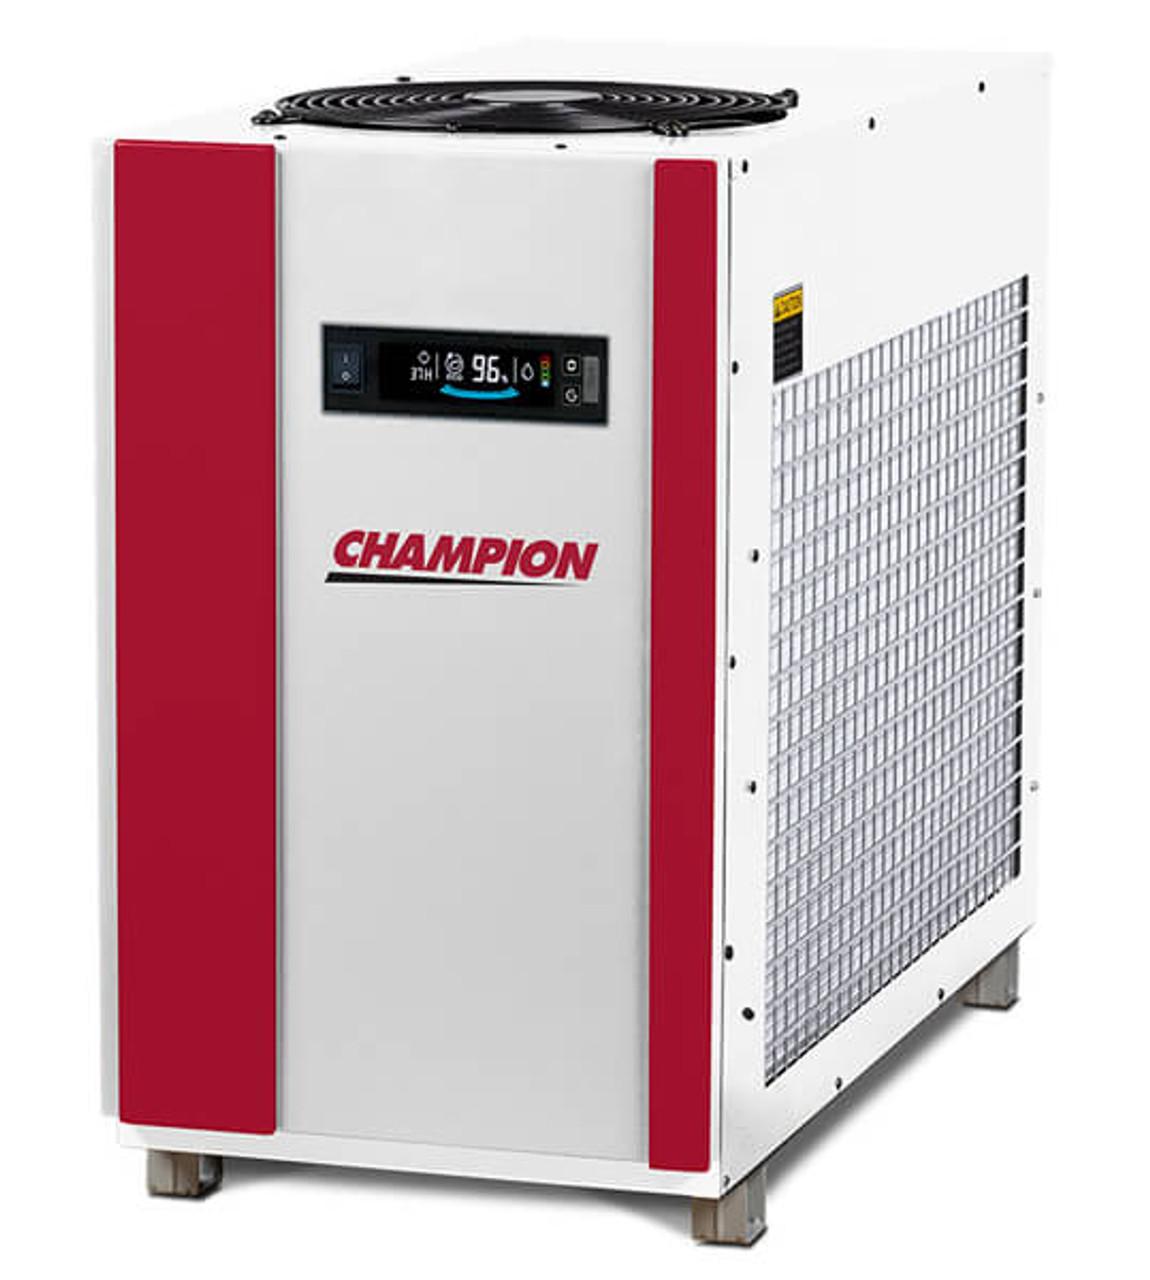 Champion CRPC450, 450 SCFM Capacity Refrigerated Air Dryer